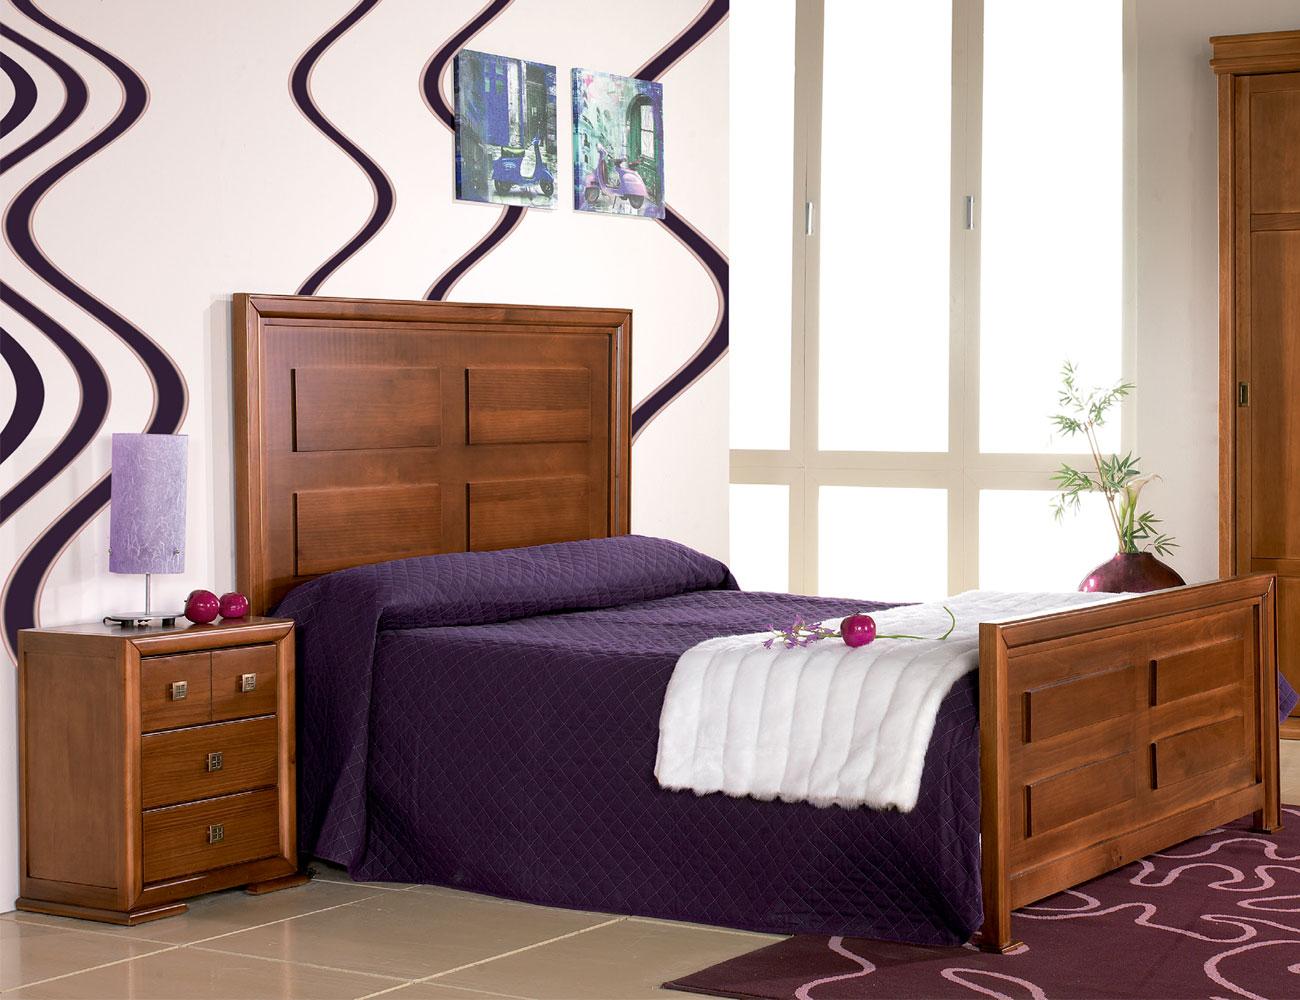 Composicion02 dormitorio matrimonio cama sevilla 21